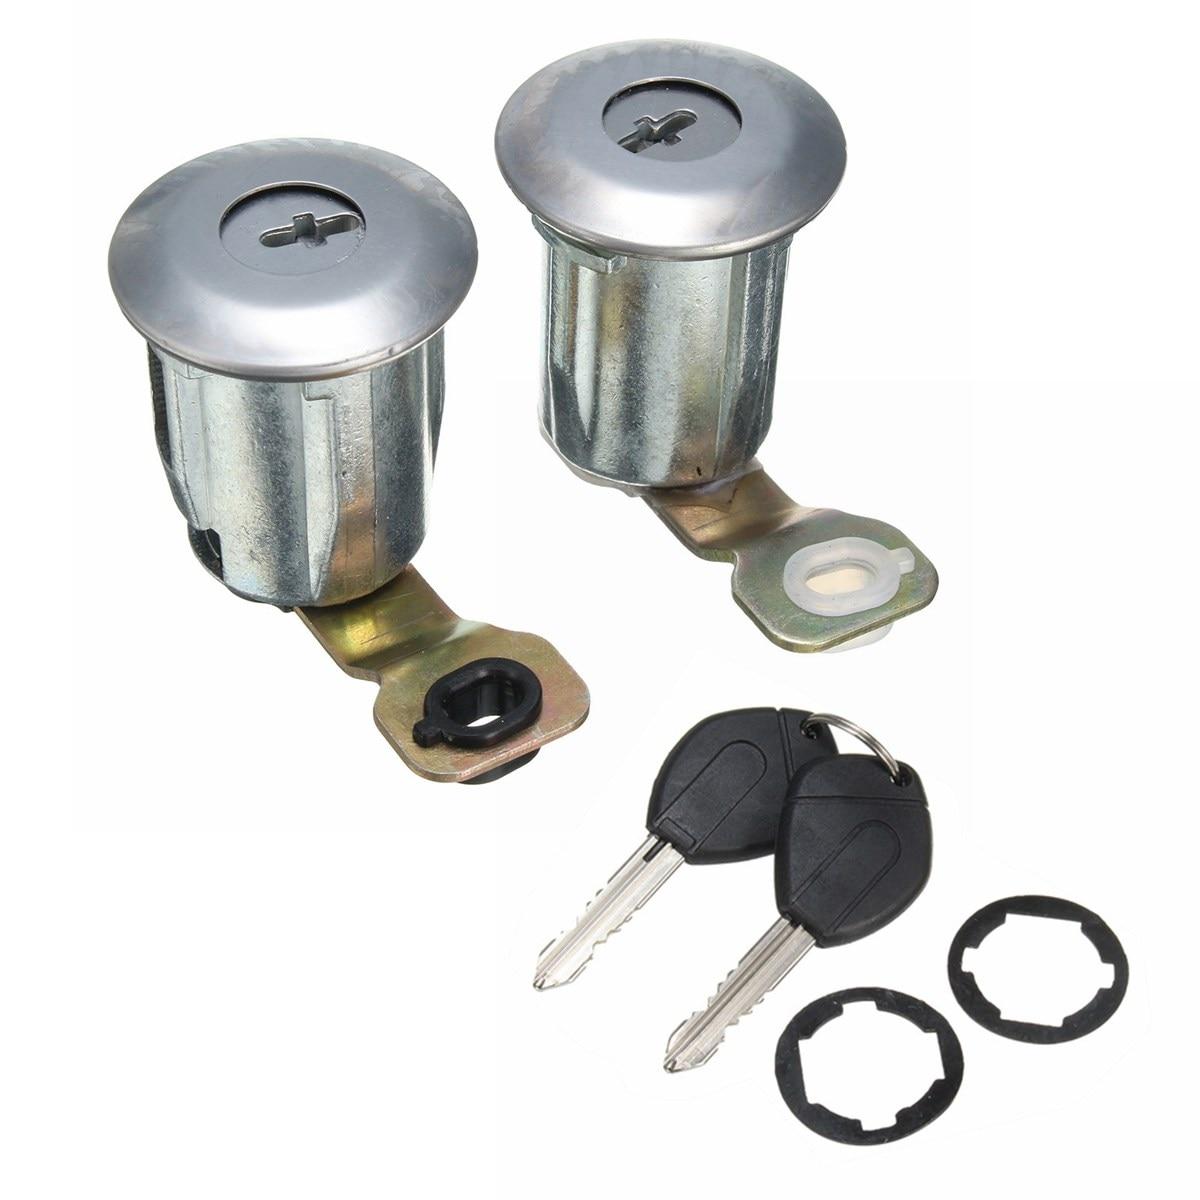 1 Set Barrel Lock Set Car Door Locks Key Set For Peugeot Partner Xsara /Citroen Berlingo